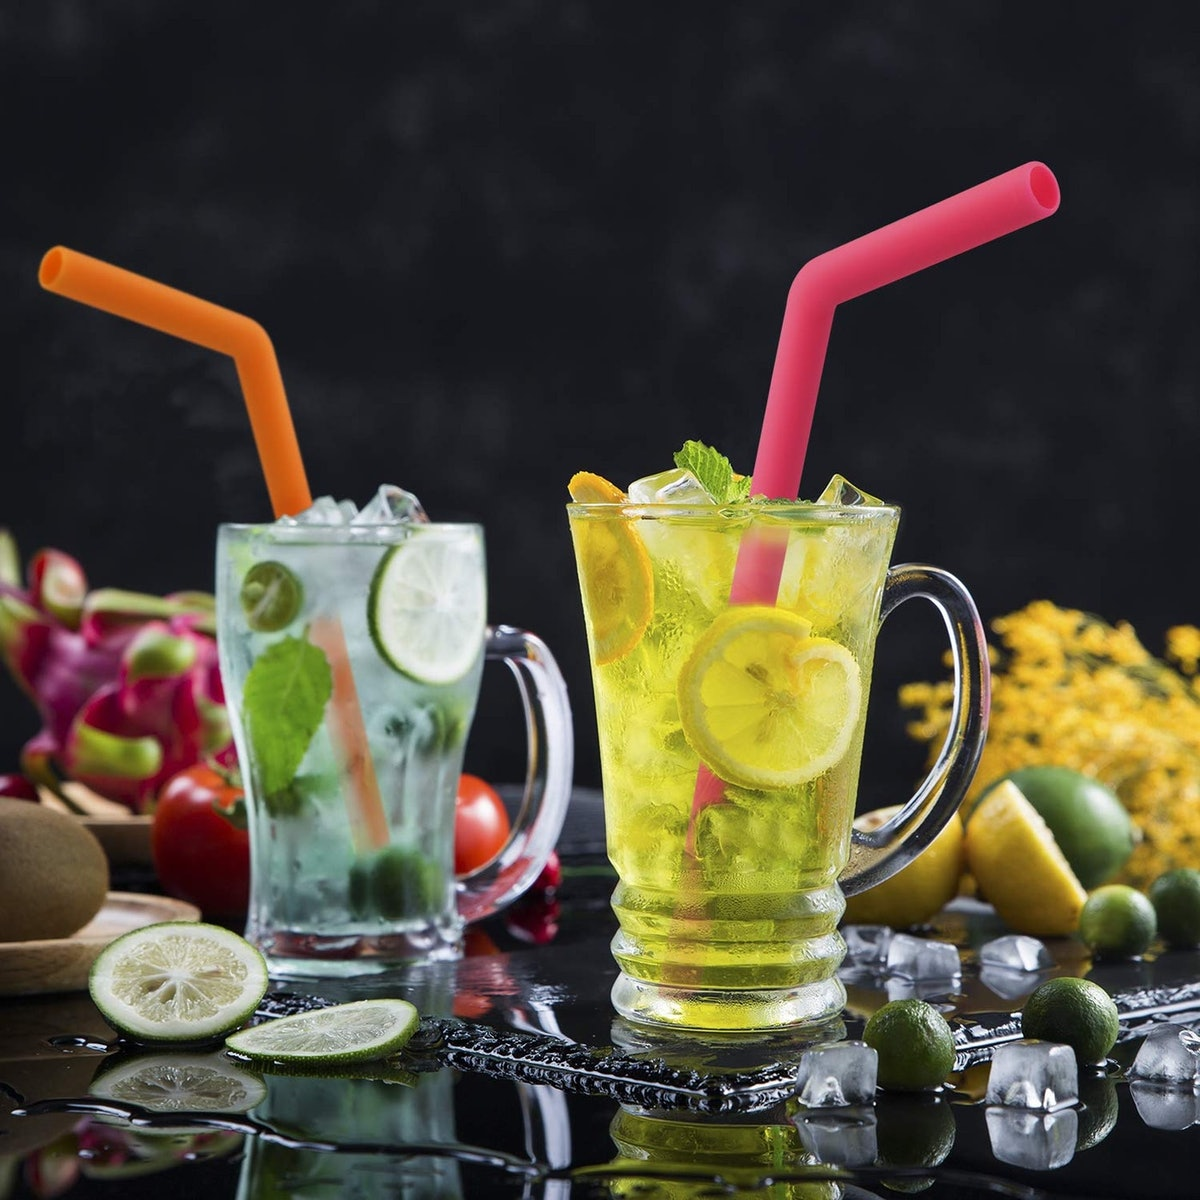 Hiware Reusable Silicone Drinking Straws